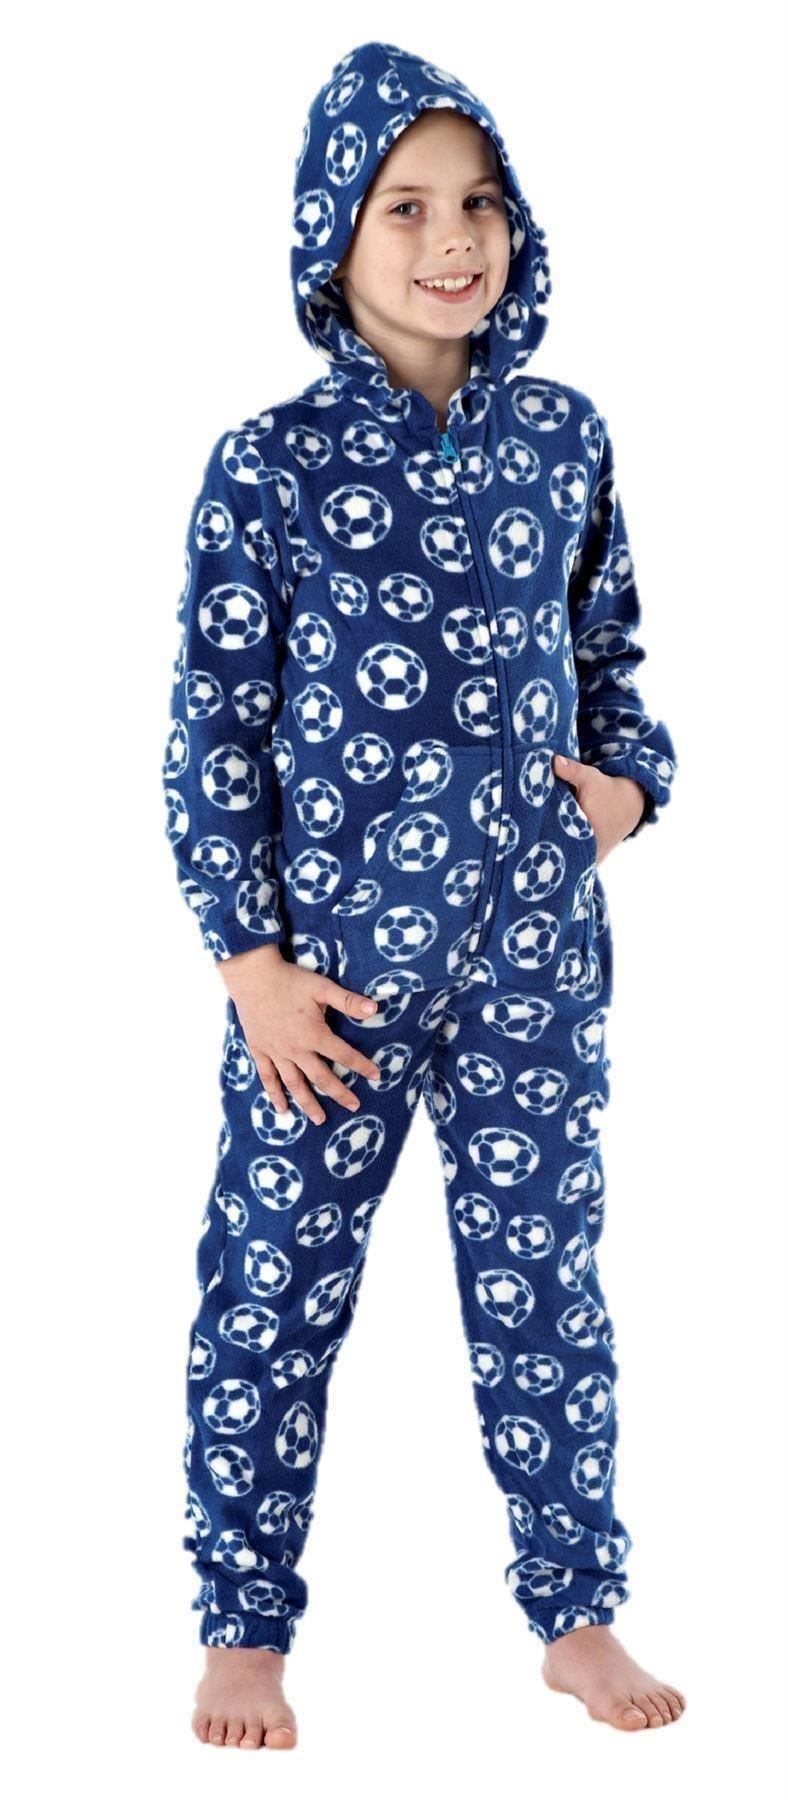 boys-all-in-one-sleepwear-pyjama-pajama-ones-one-piece-hoodie-FOOTBALL thumbnail 9